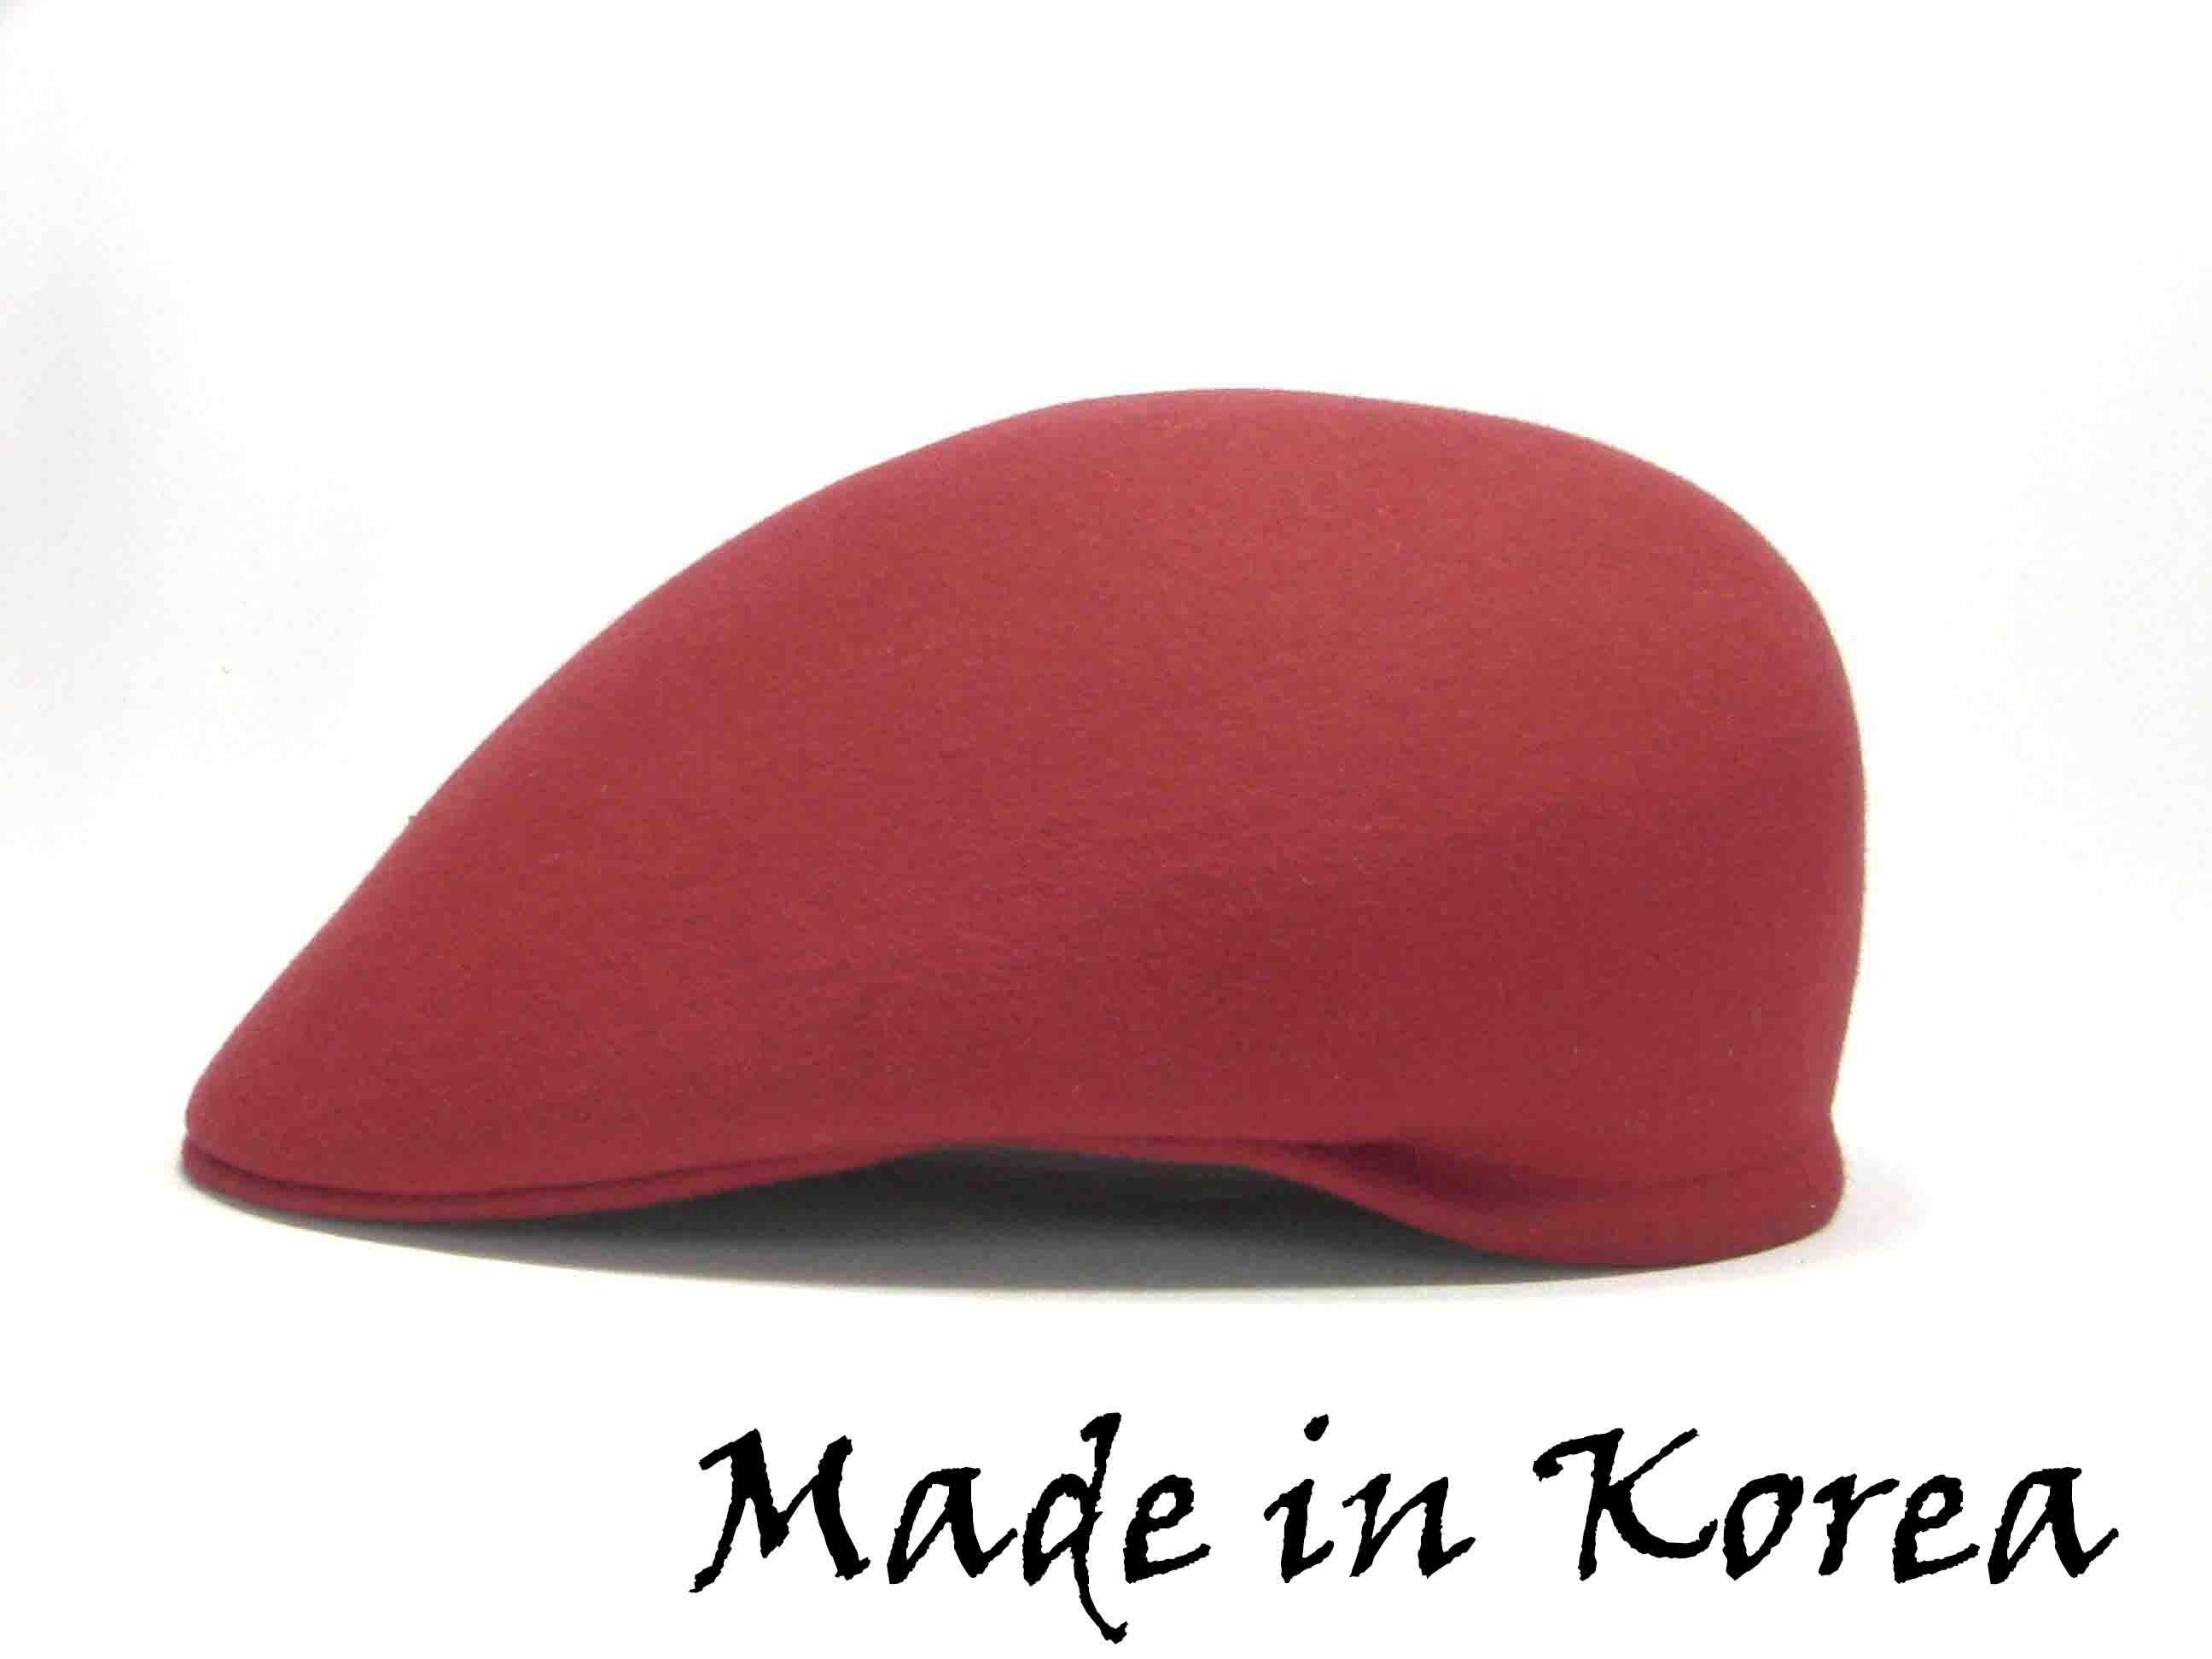 Qoo10 - New Felt Flat cap Newsboy Hunting Cabbie Hat  H204 Made in ... 45aa404394a